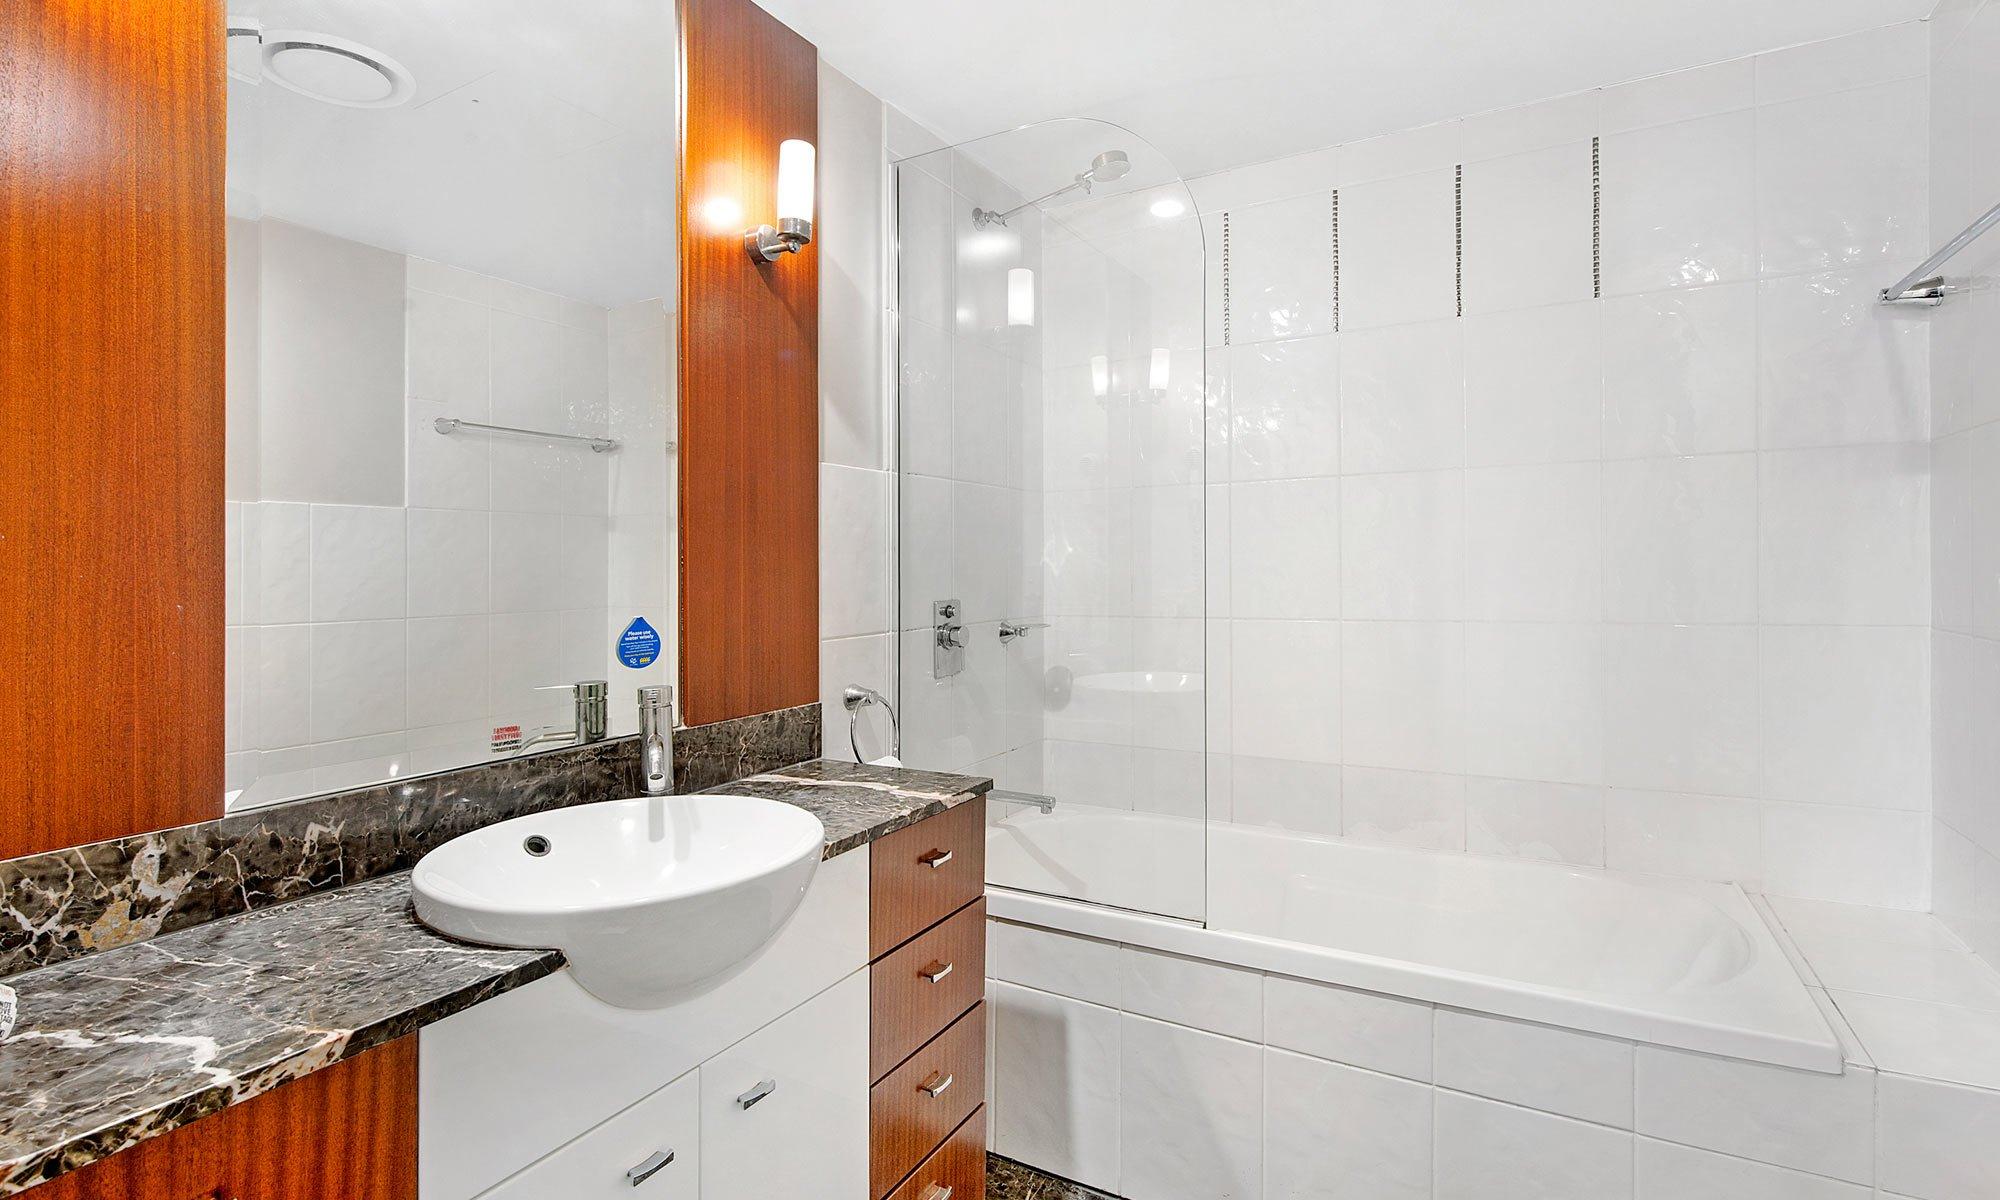 Gold Coast real estate for sale Chevron Renaissance 3073 second bathroom